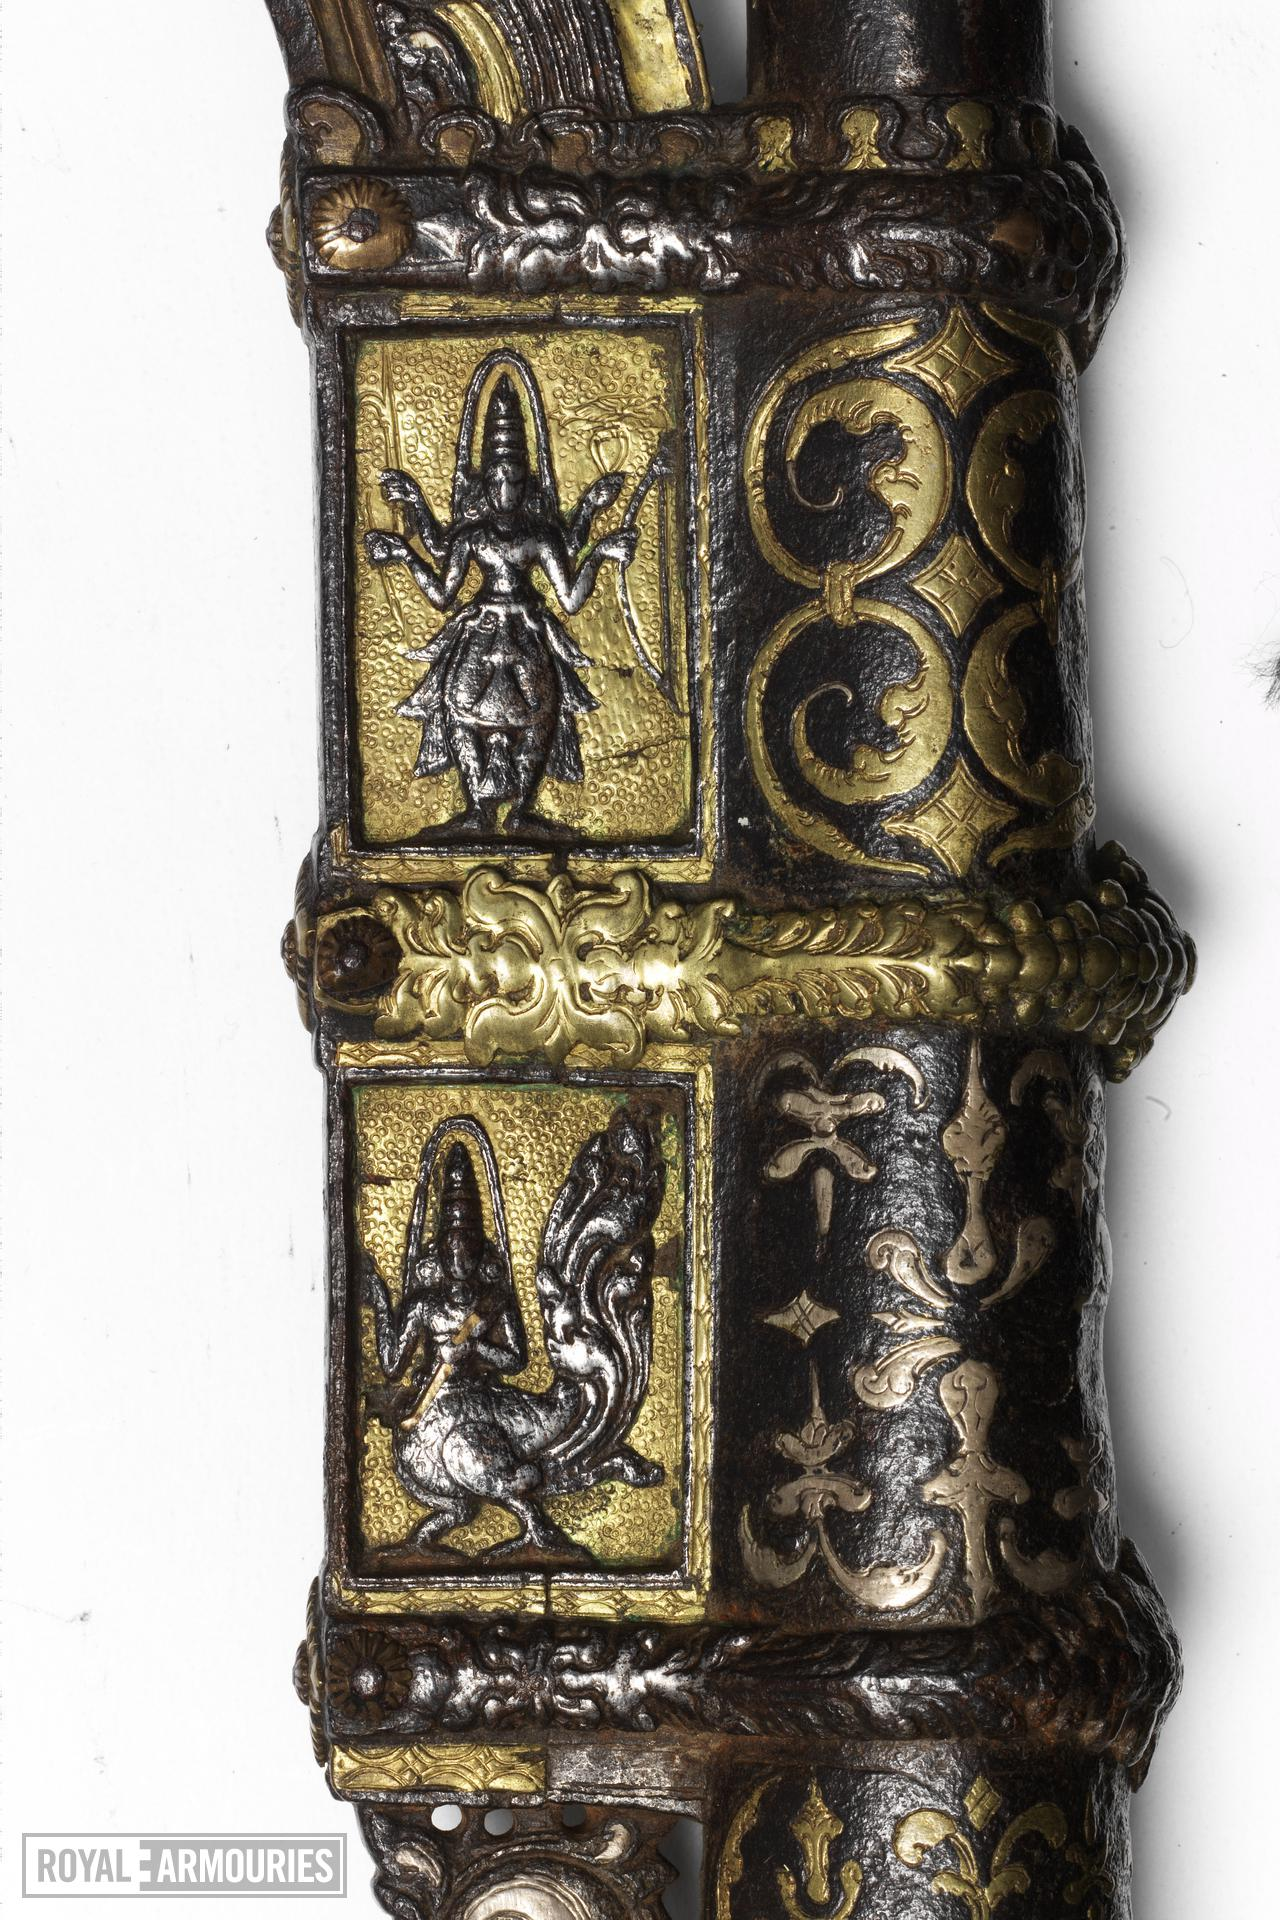 Elephant goad (ankus) with lacquered haft